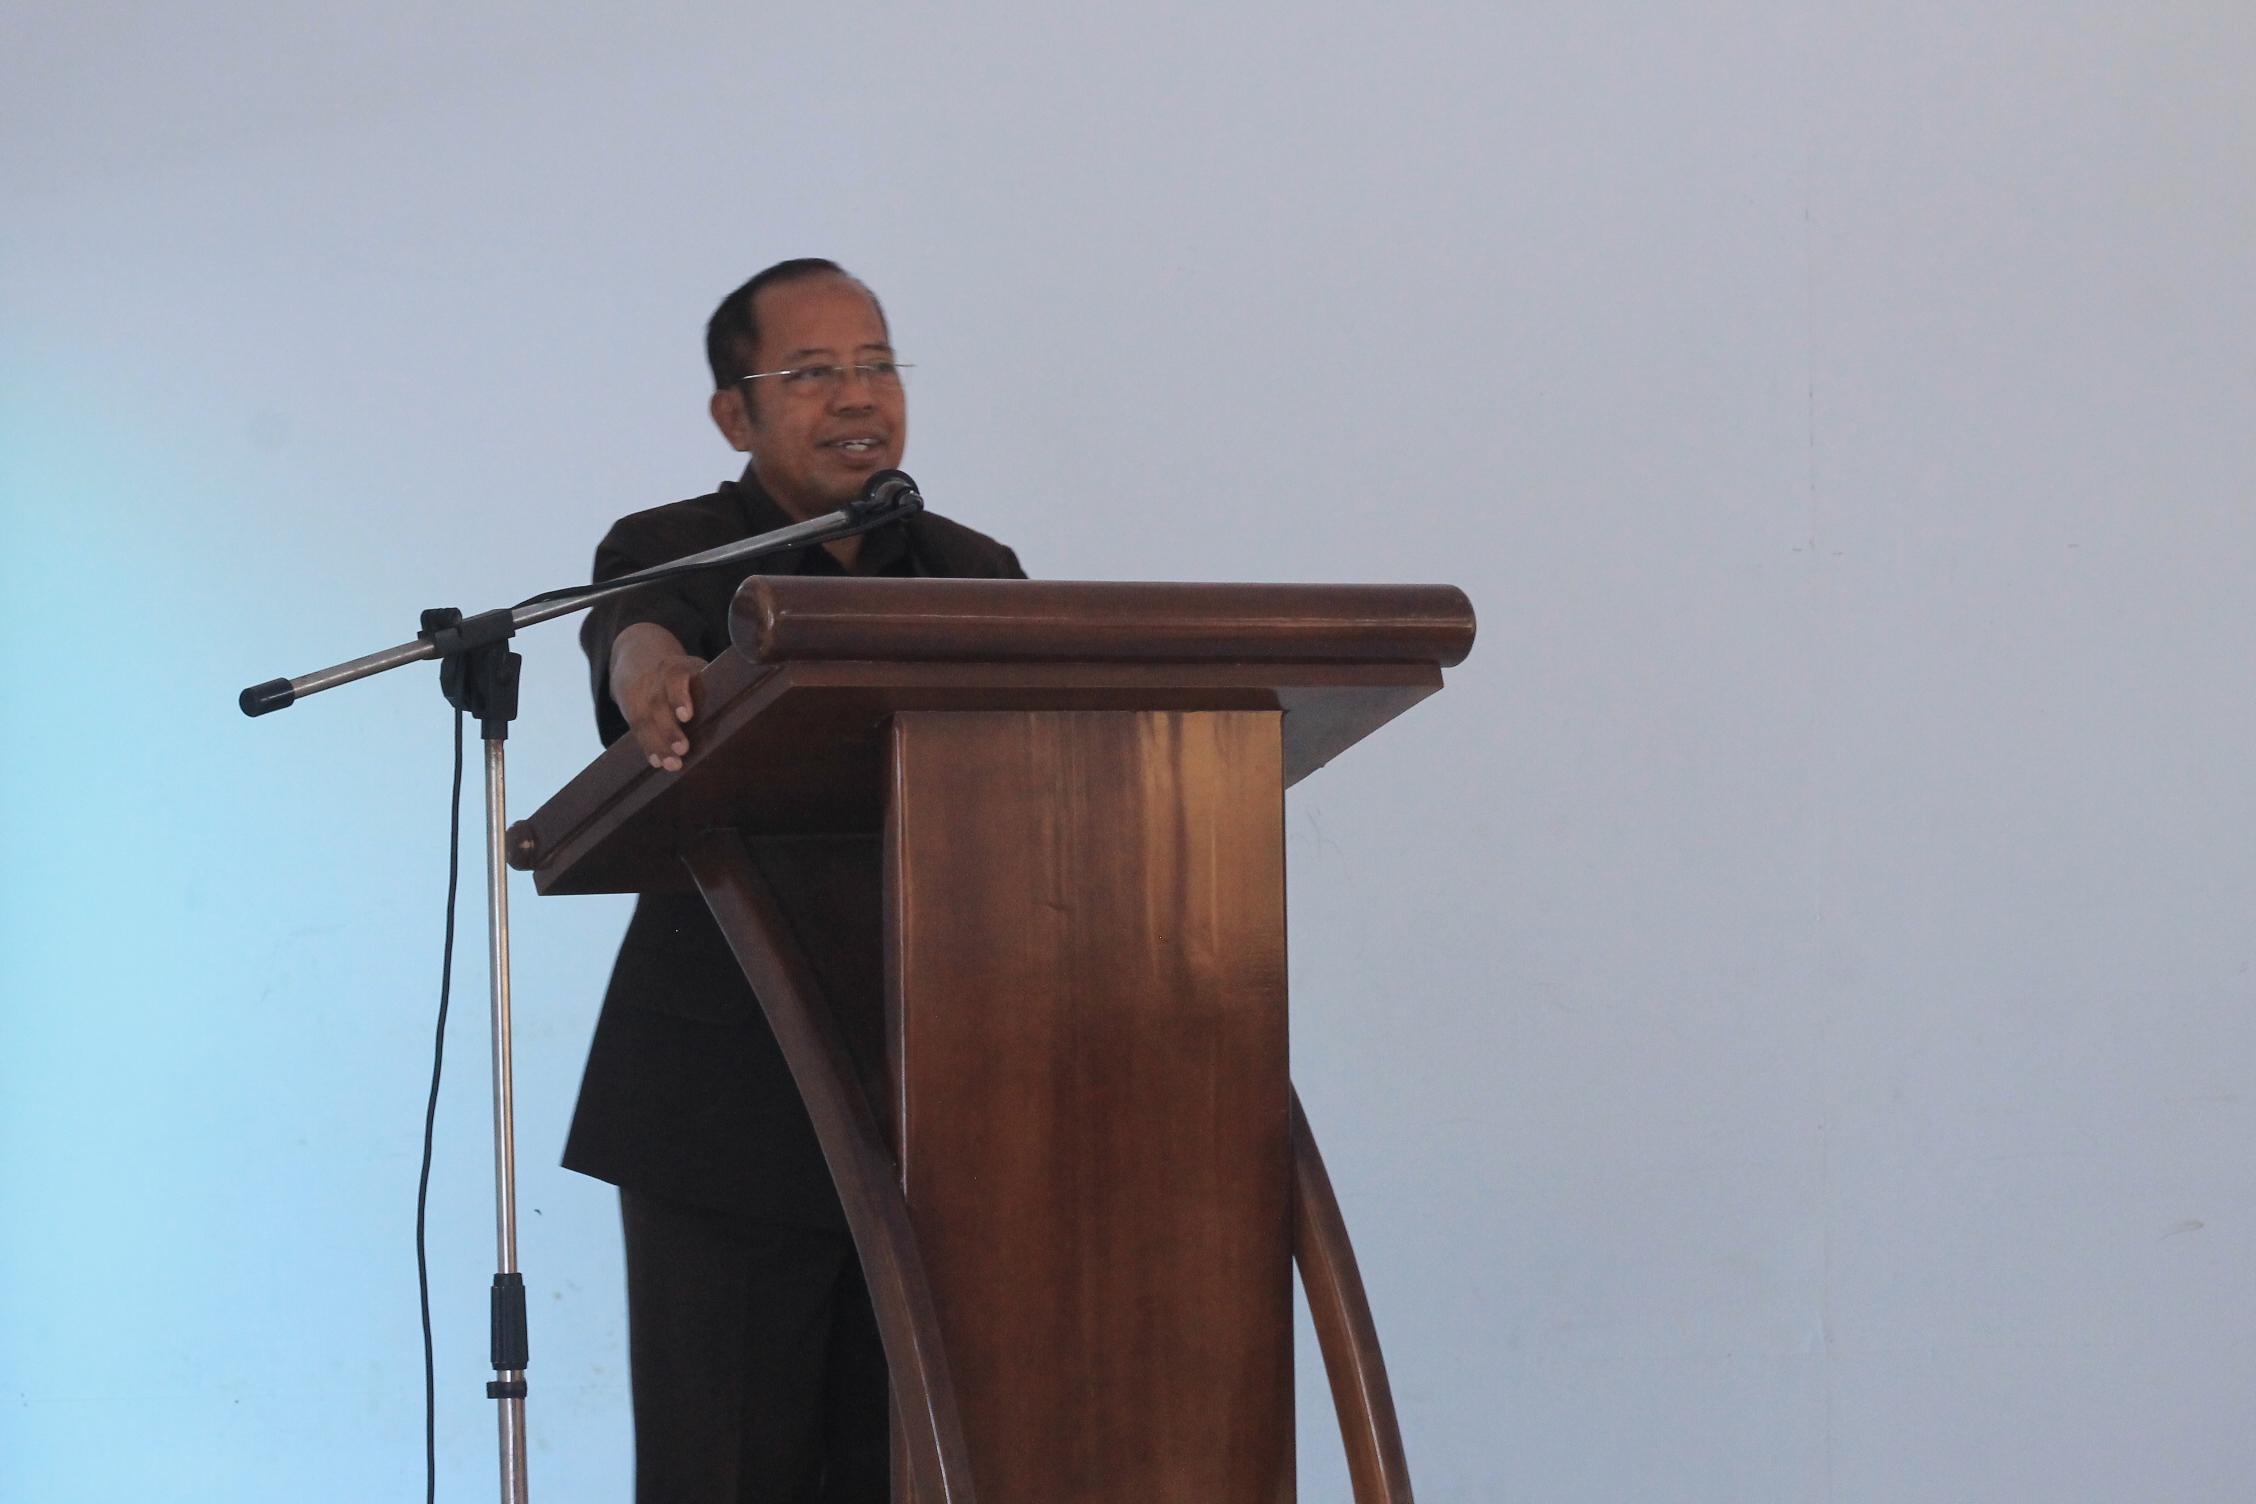 Pemkab Bengkulu Utara Gelar FGD Pengembangan Kawasan Transmigrasi